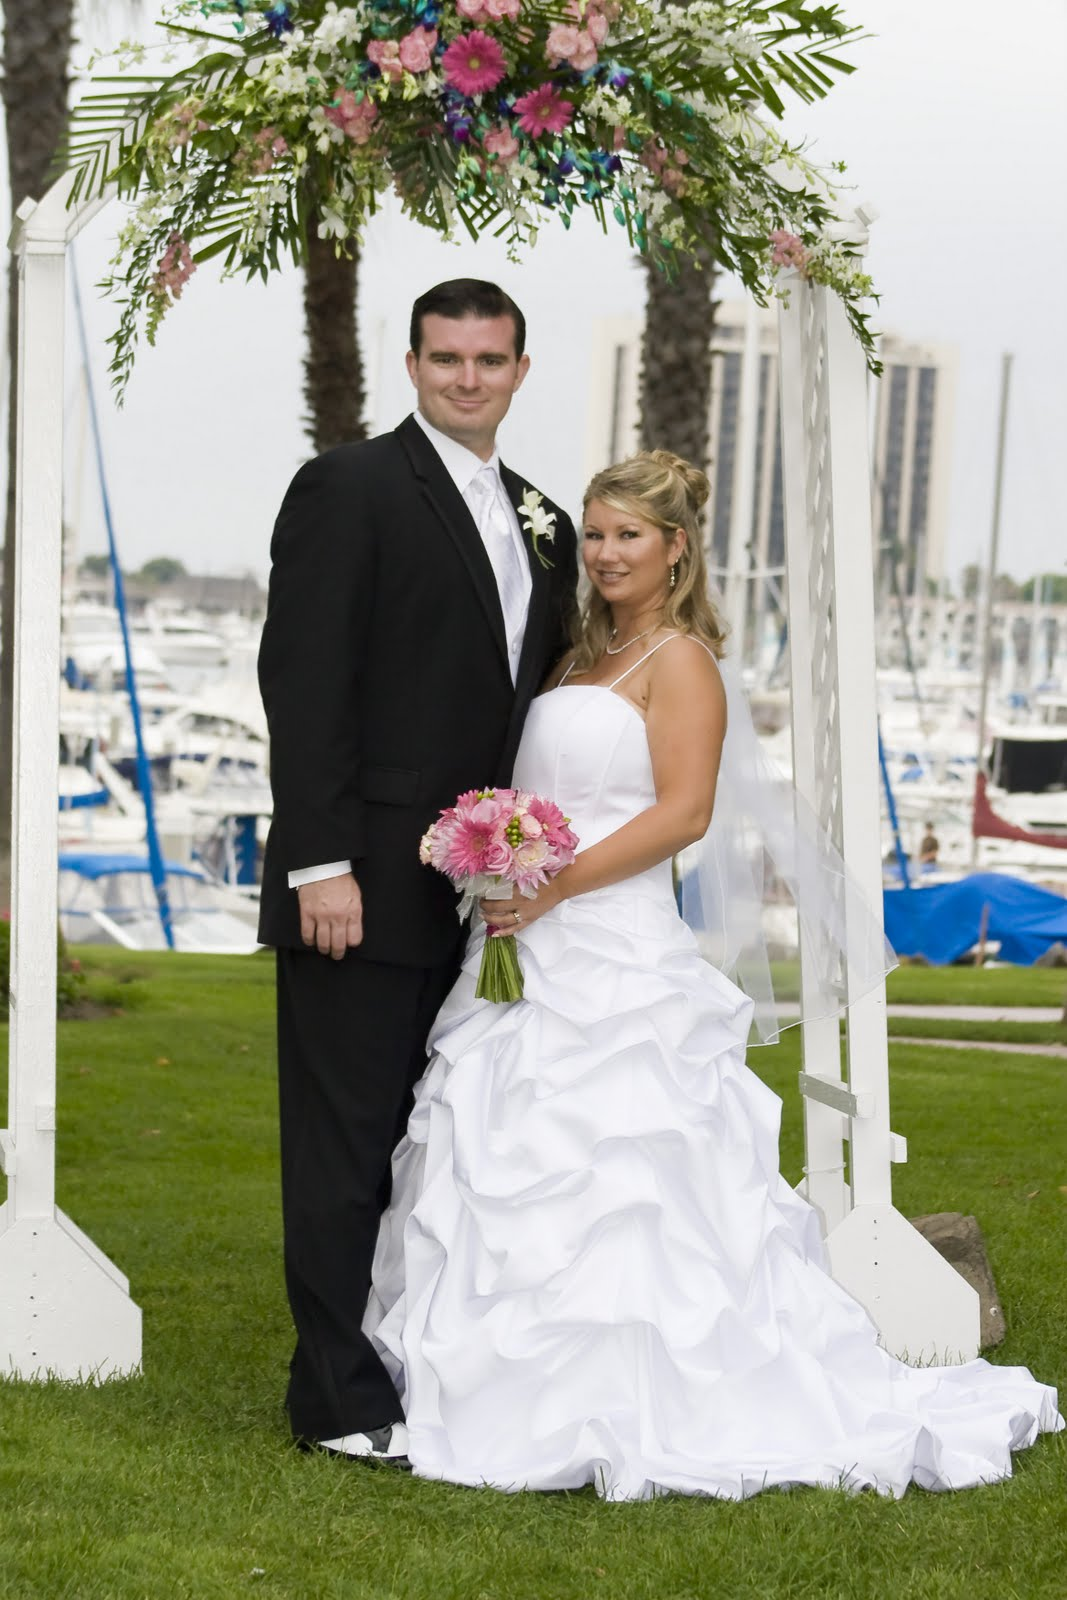 floral occasions by janna hatch marina village san diego wedding florist. Black Bedroom Furniture Sets. Home Design Ideas